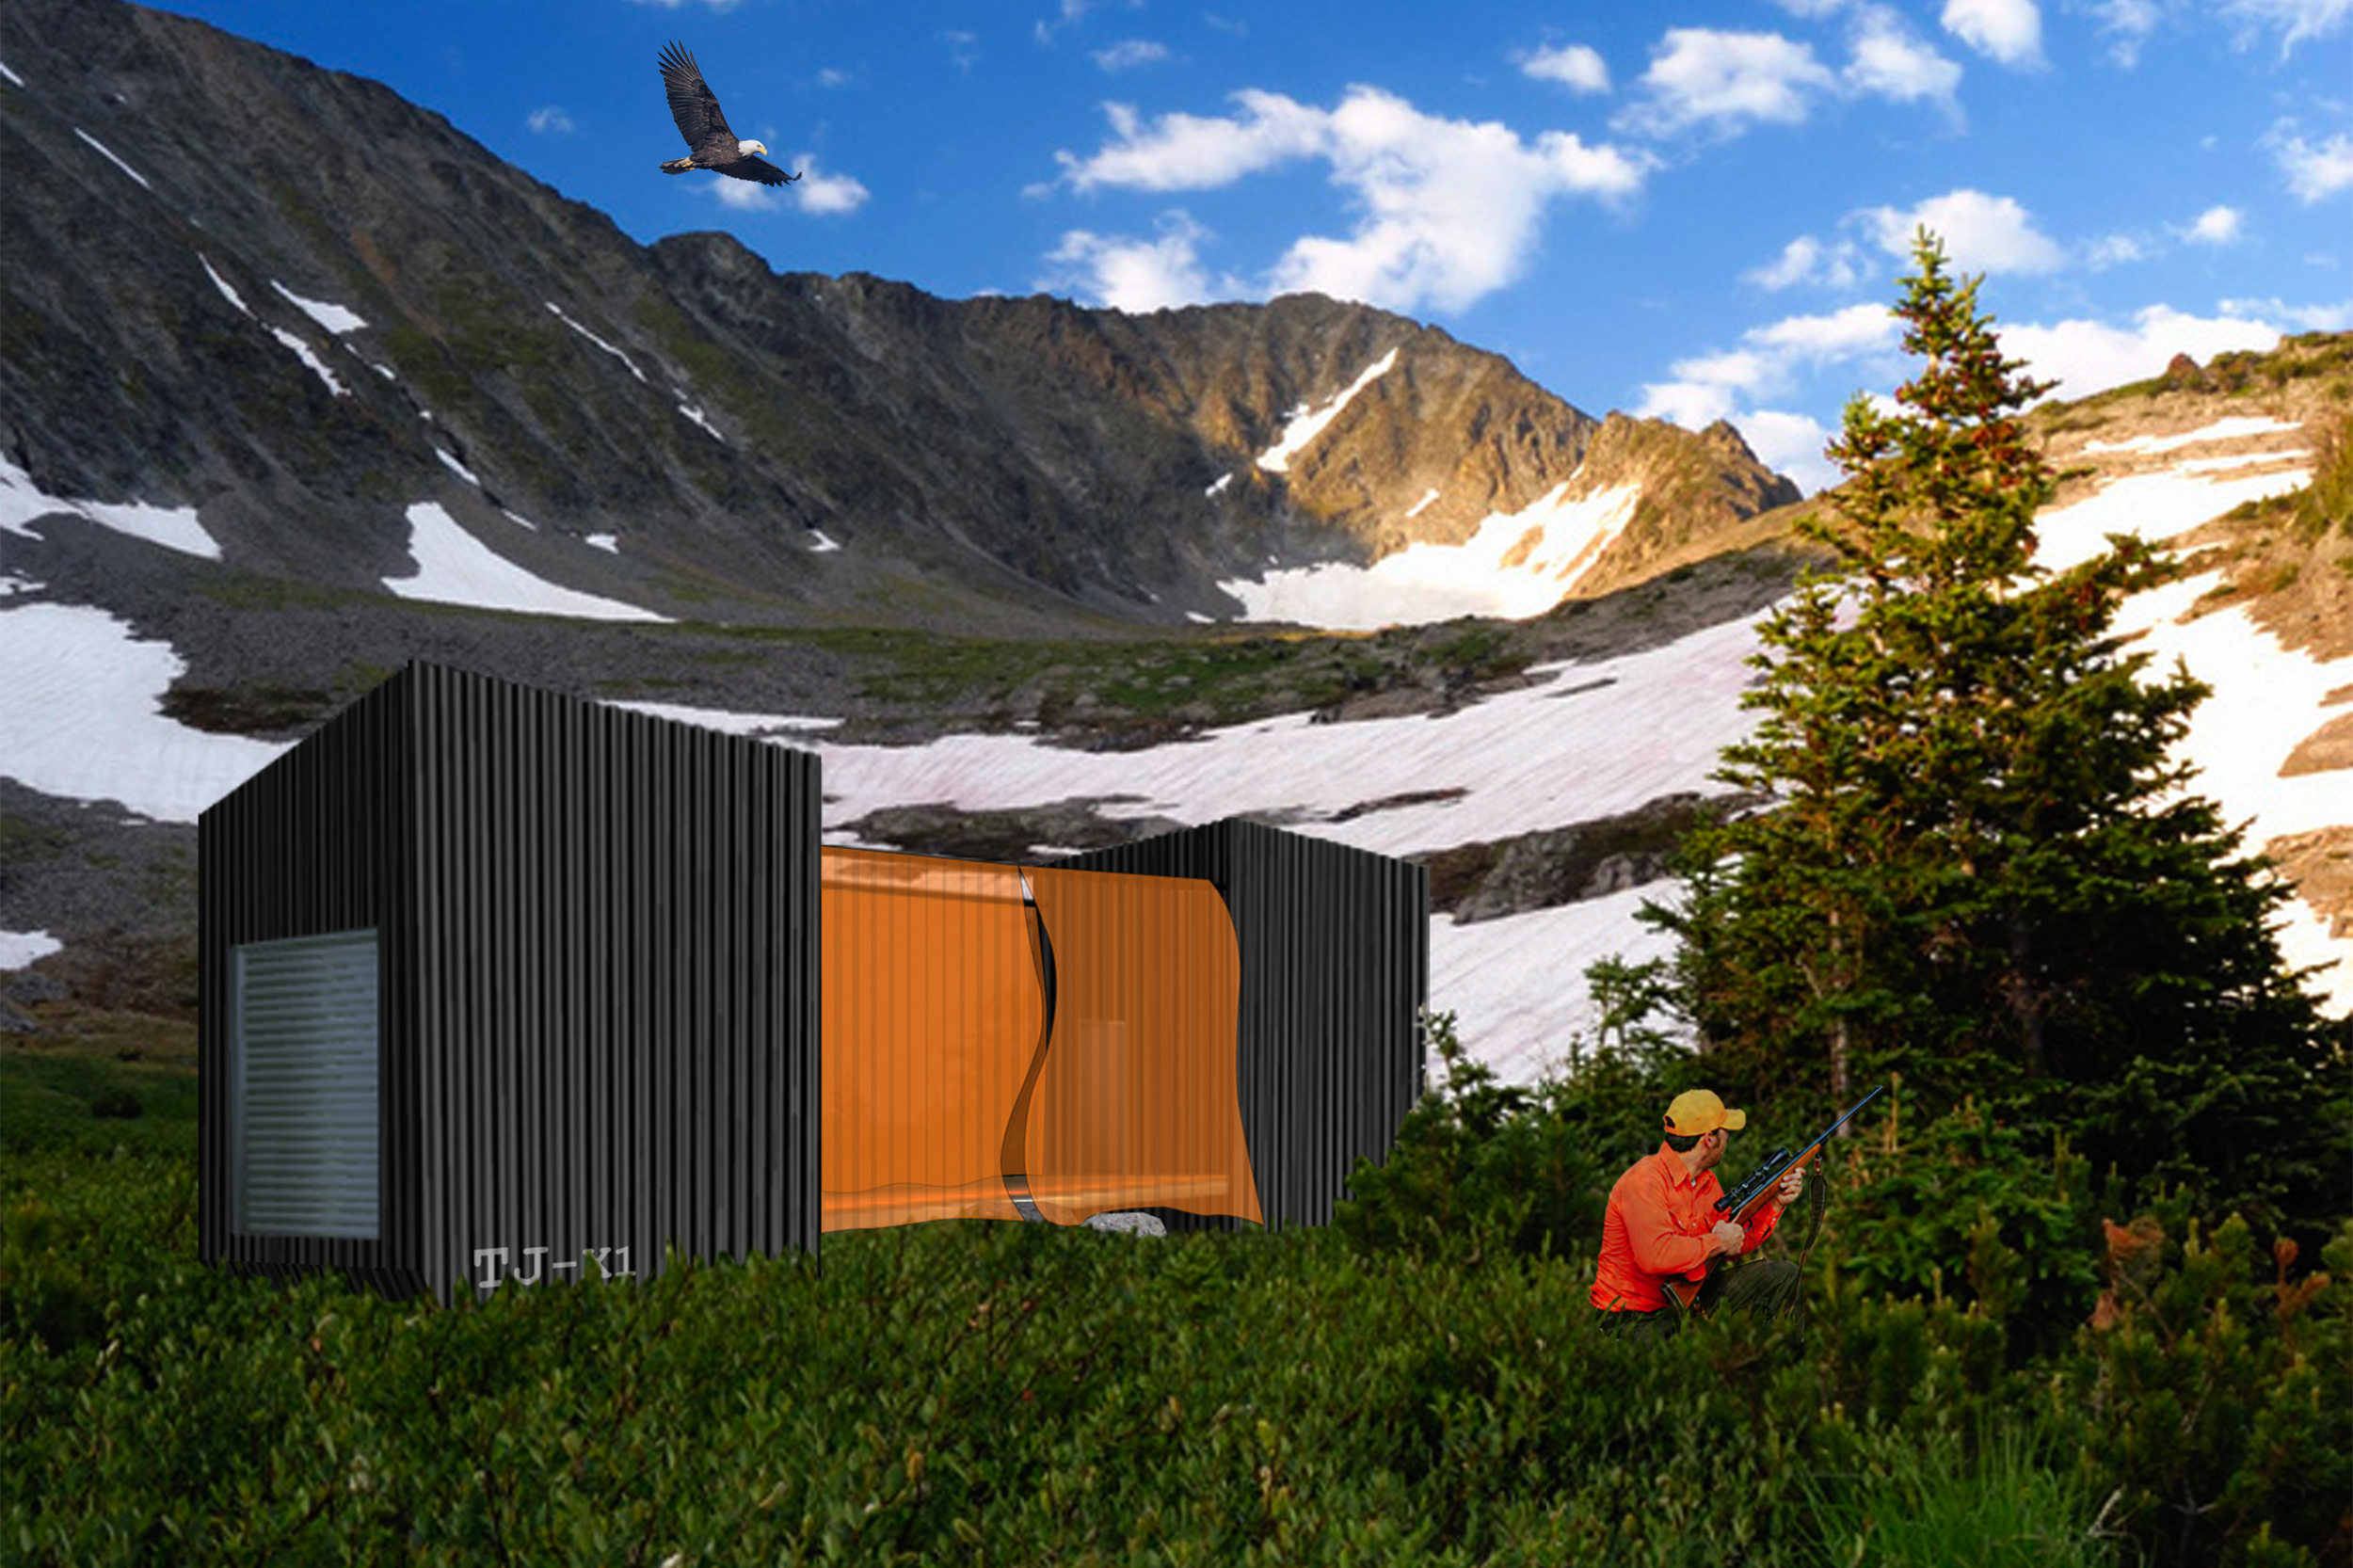 Camp Cabins TJ-X1